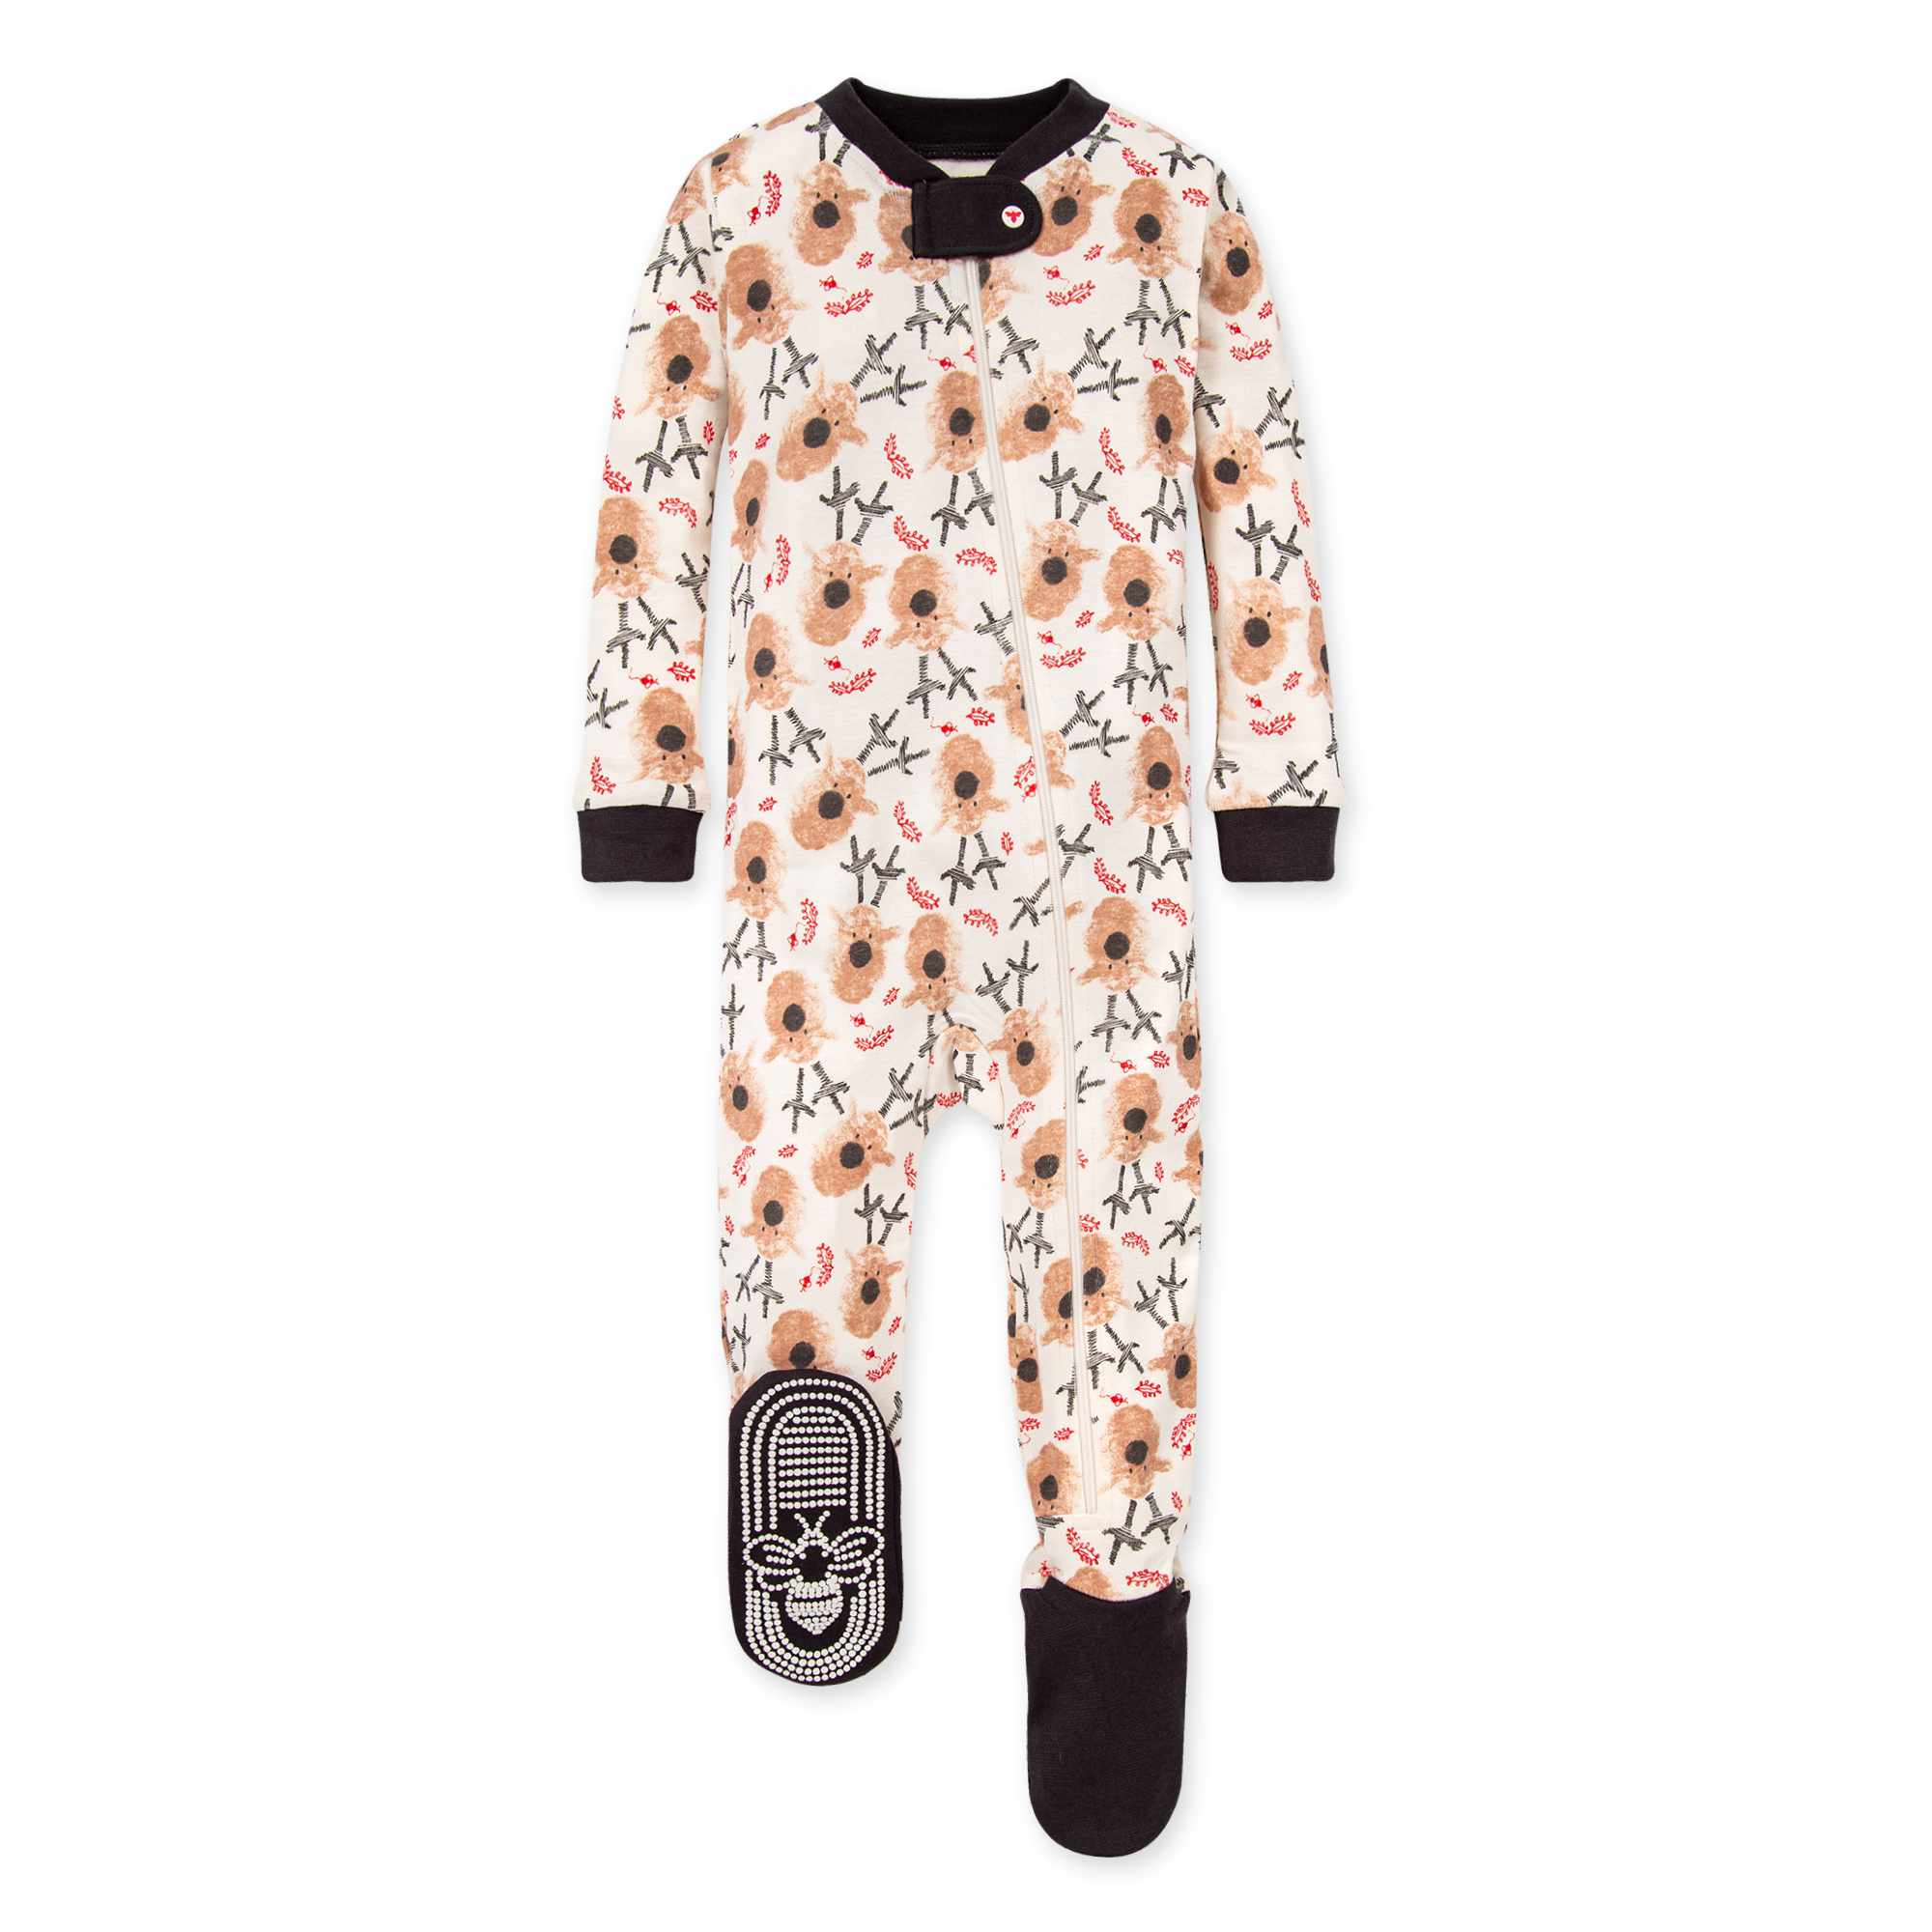 Burt's Bees Matching Family Pajamas